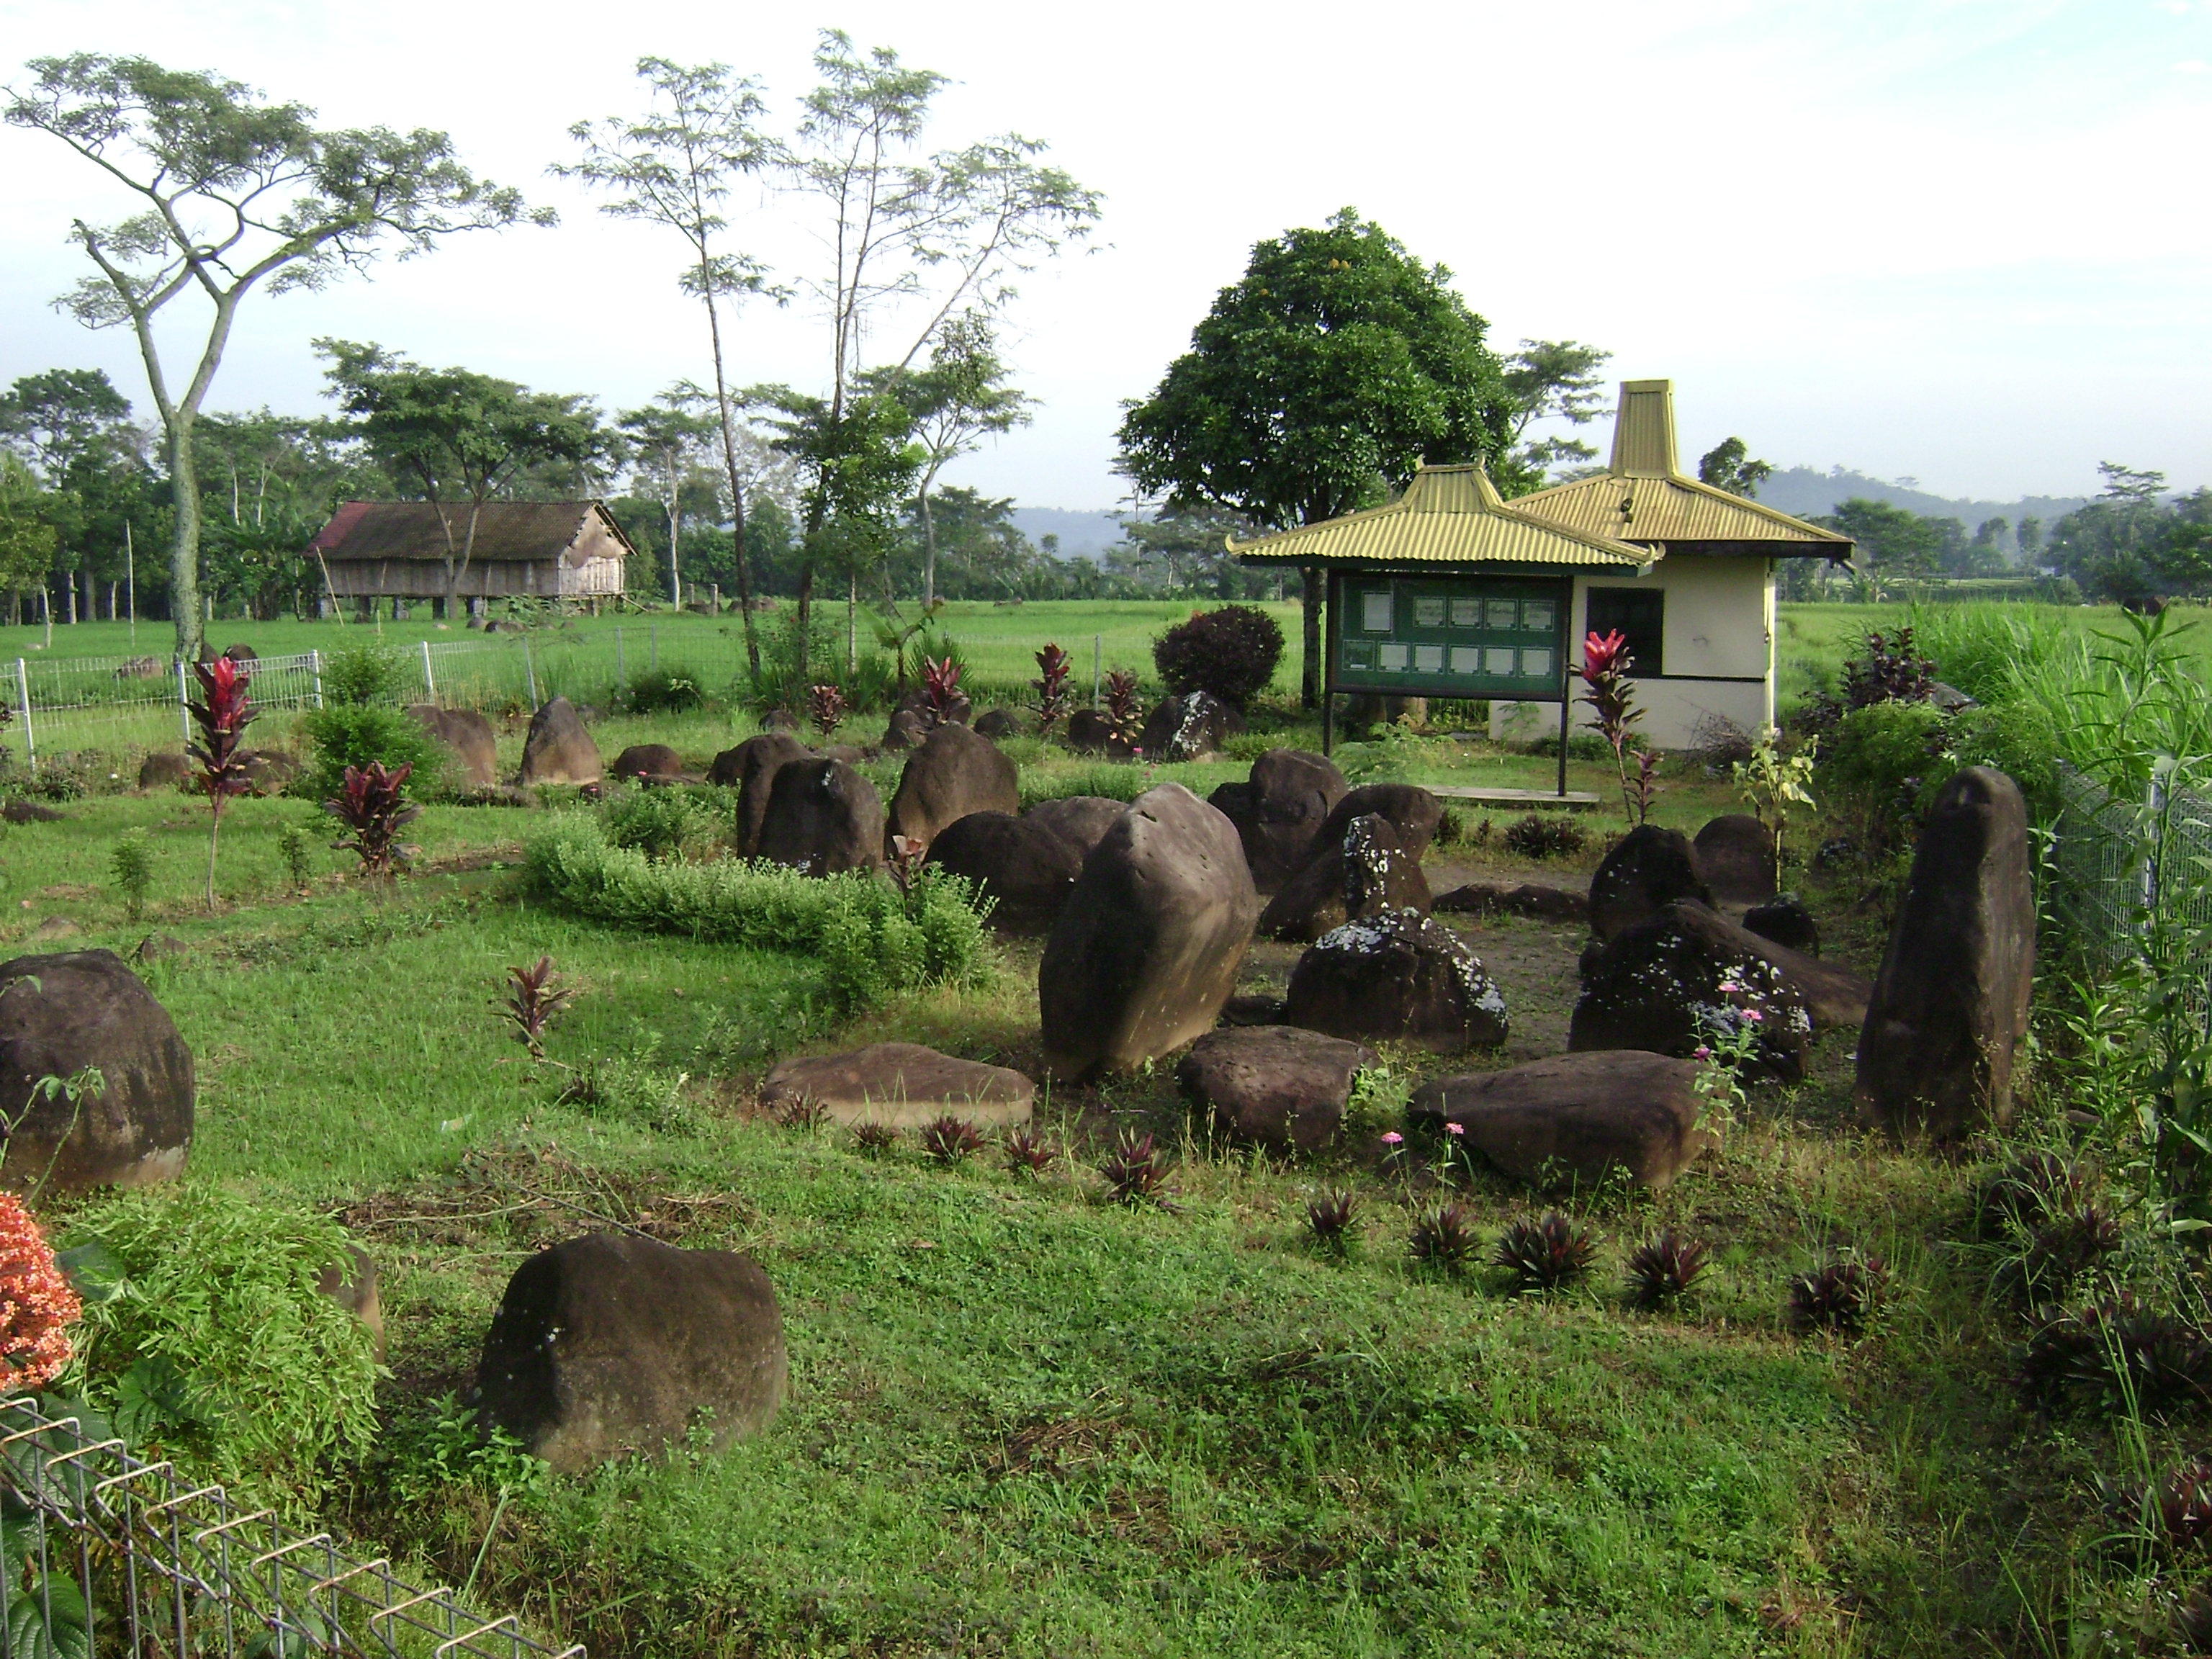 Wisata Sejarah Page 3 Situs Watukandang Watu Kandang Kab Karanganyar